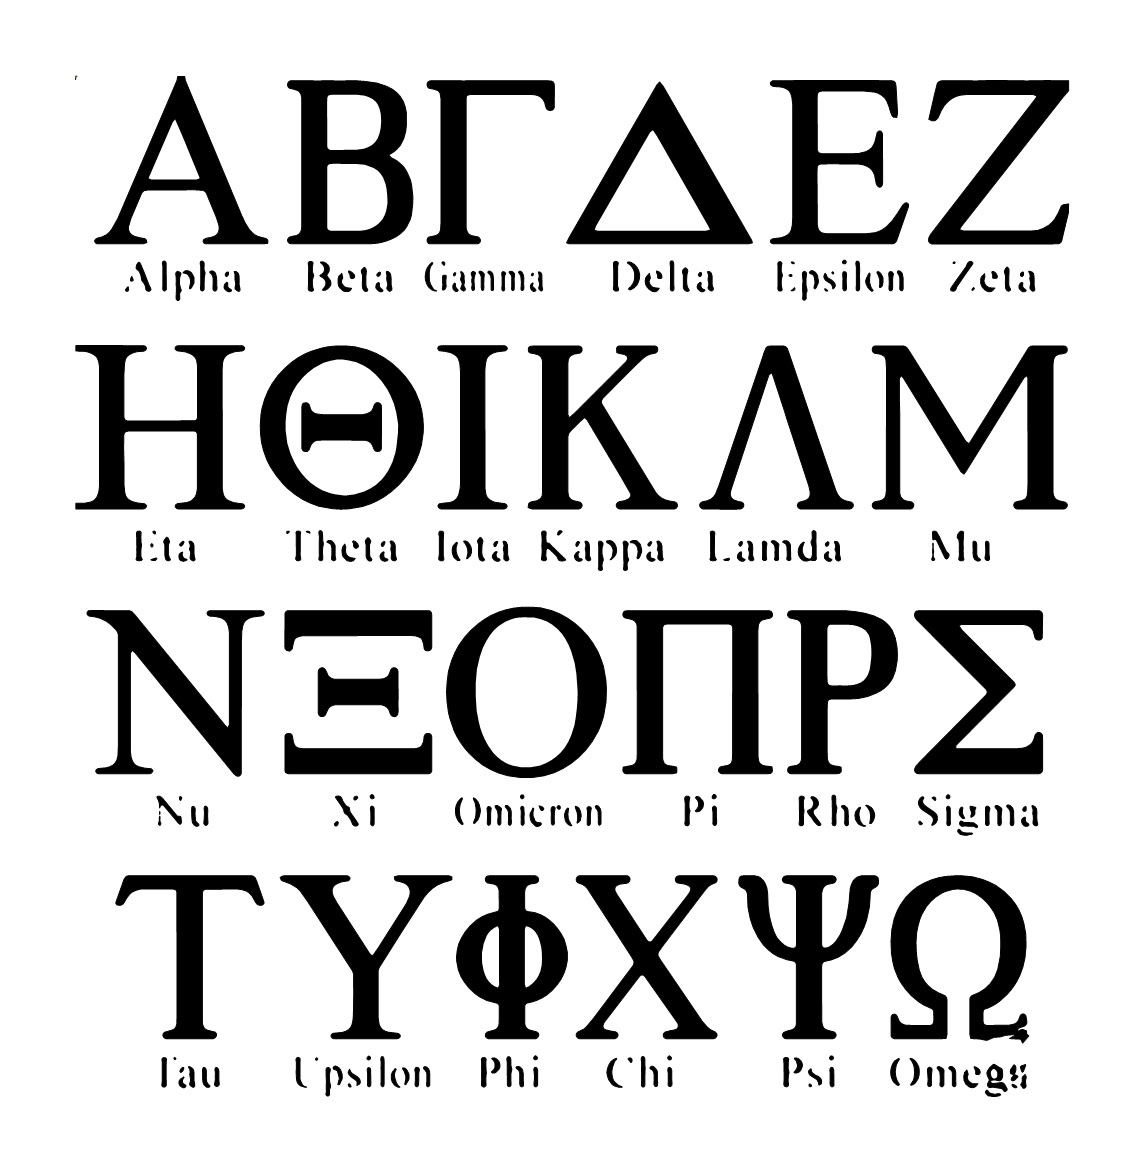 GW Admissions Student Blog: Alternative Greek